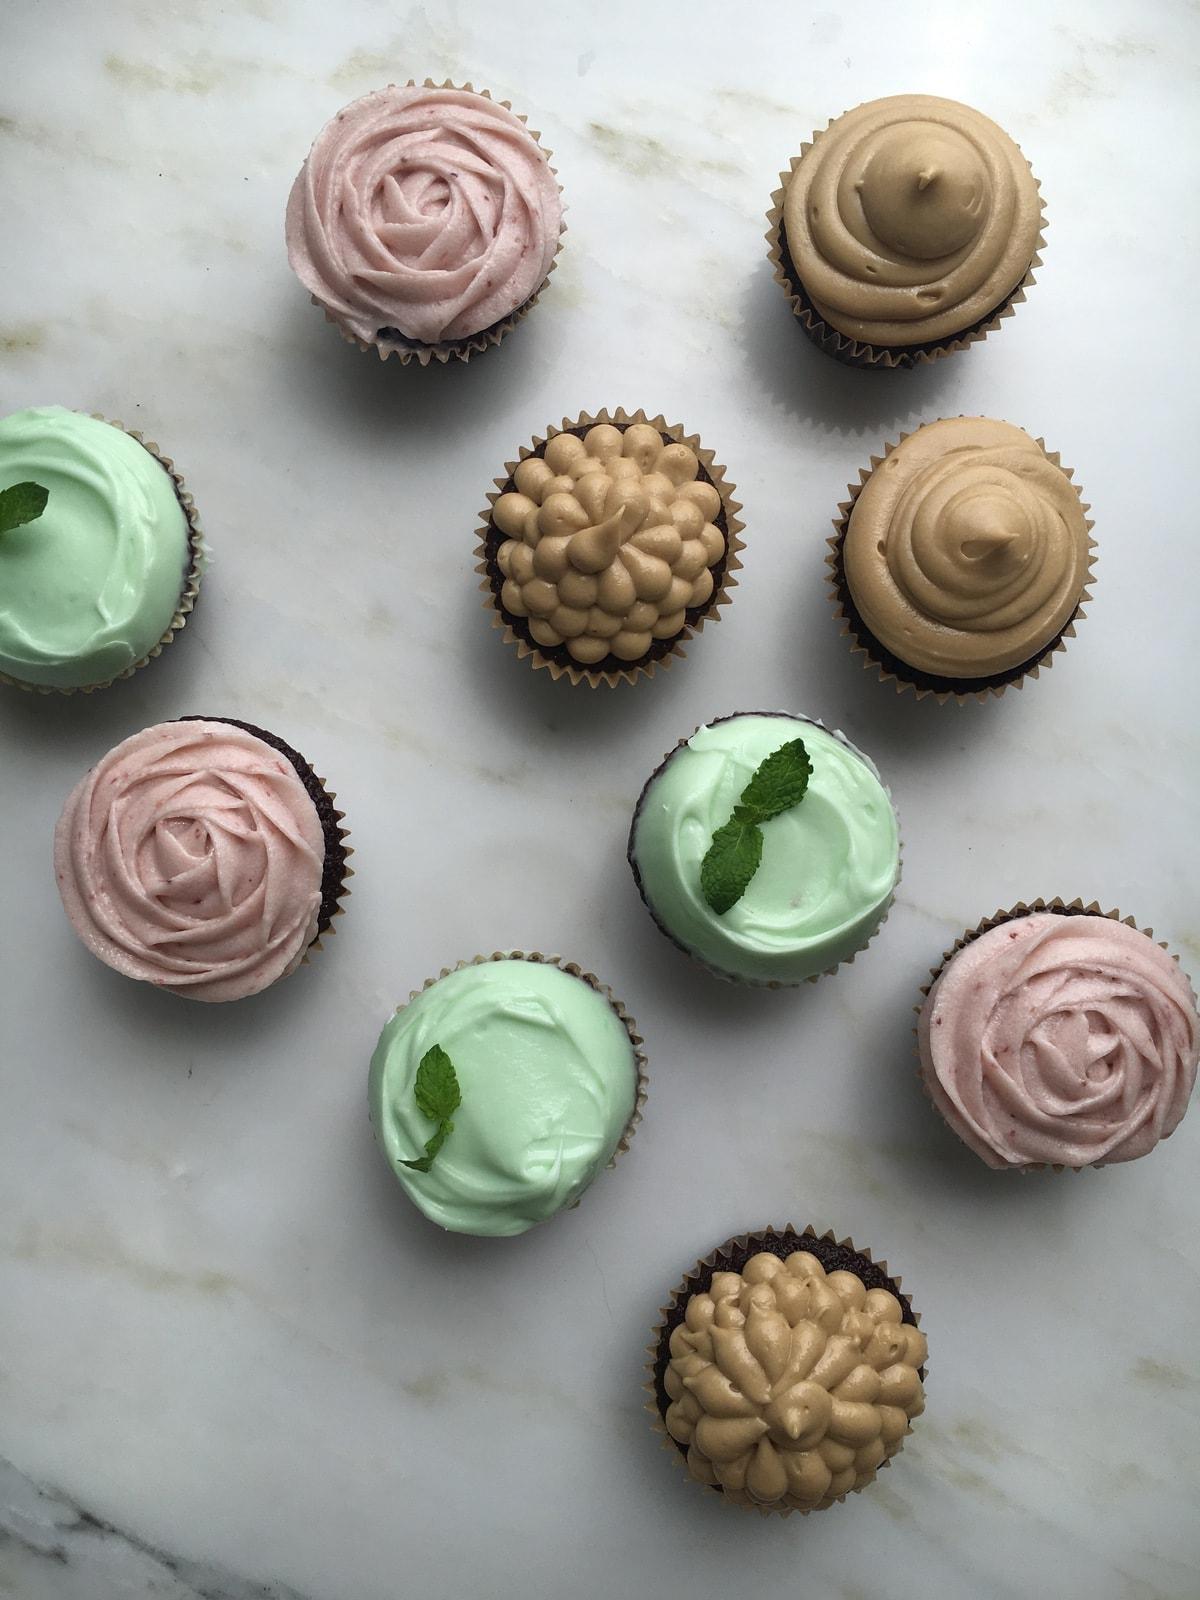 A Cozy Coloring Cookbook: Cupcakes